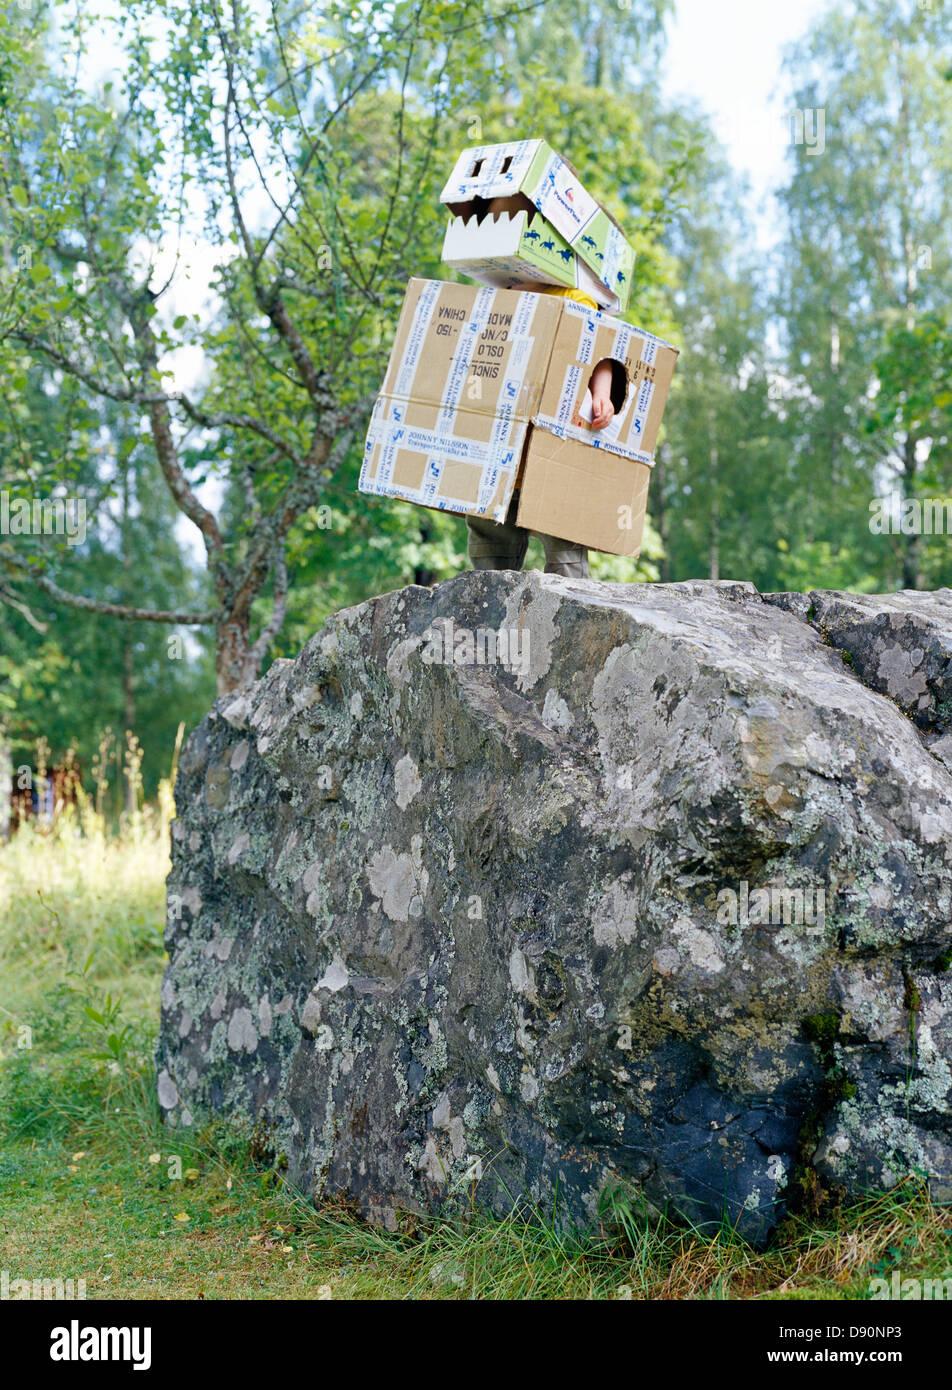 A dragon made of cardboard, Dalarna, Sweden. - Stock Image